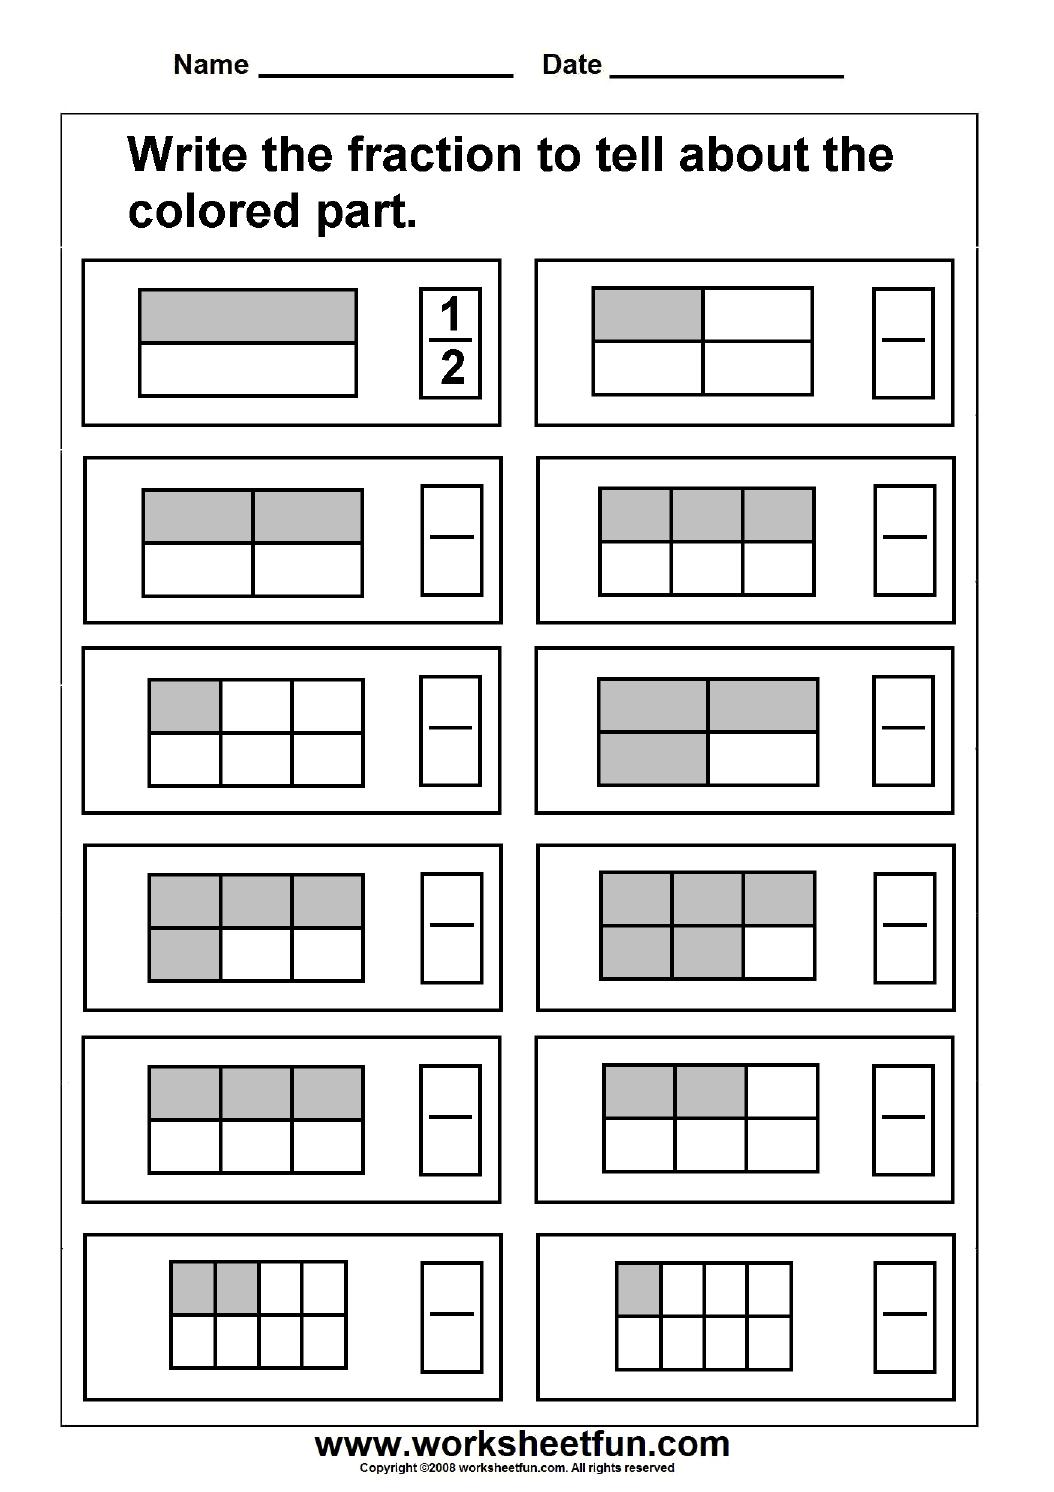 hight resolution of Fraction Worksheets For Grade 3 Site:pinterest.com To You. Fraction  Worksheets for Grade 3 - 3rd G…   Fractions worksheets